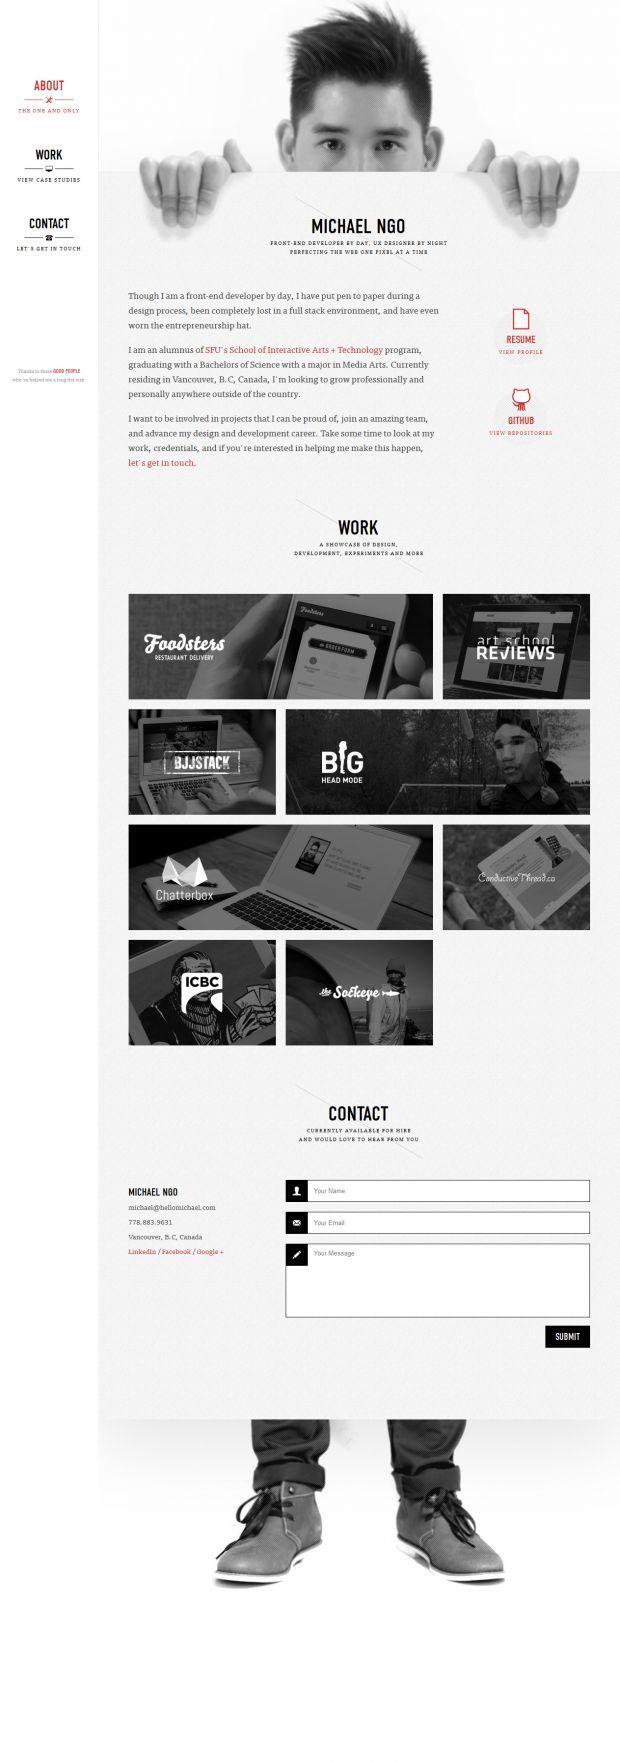 Portfolio of Michael Ngo - Front-End Developer and UX designer - www.niceoneilike.com - #Portfolio, #Development, #Creative, #Inspiration, #Design, #Website